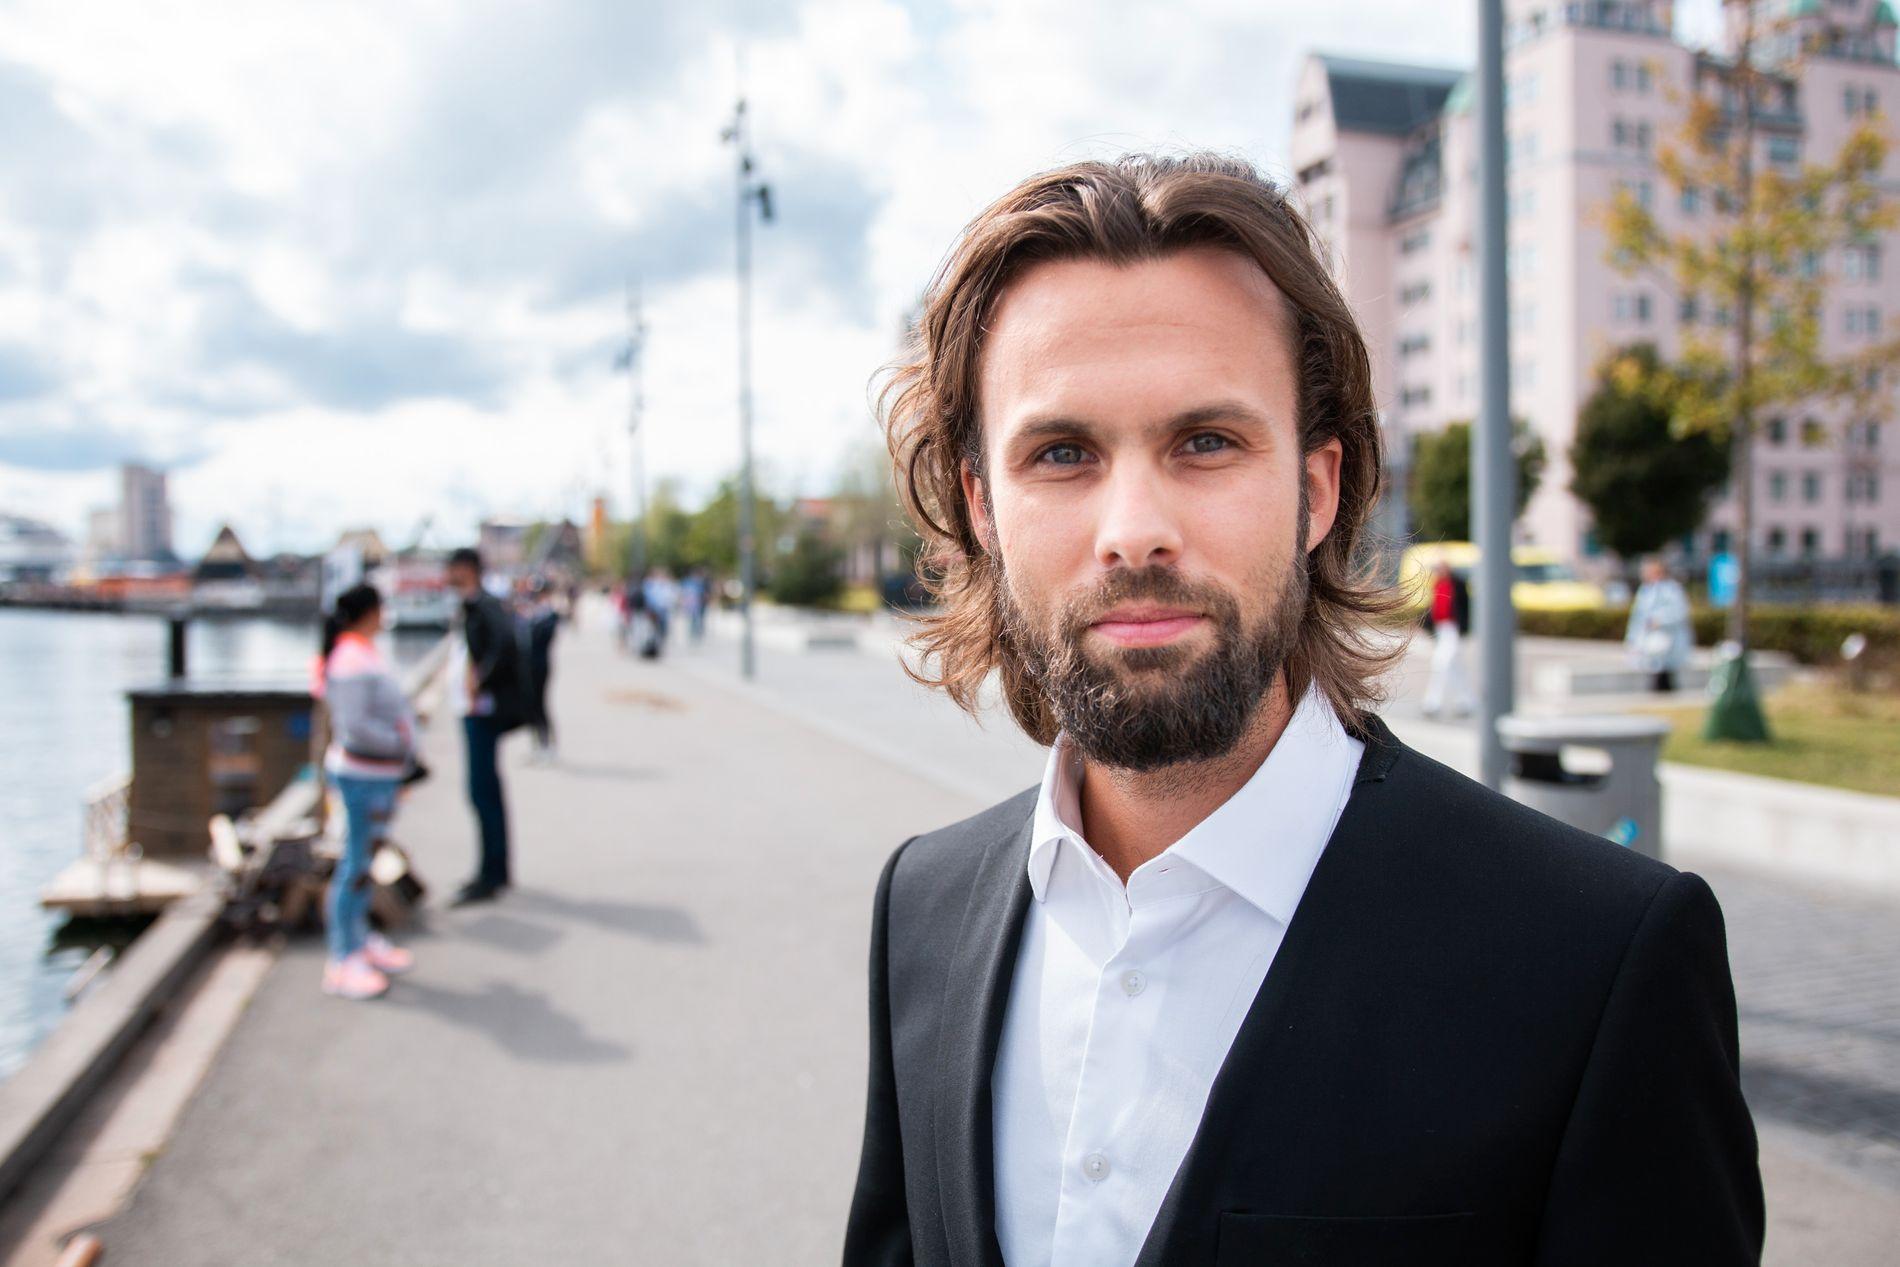 JURIDISK SENIORRÅDGIVER: Thomas Iversen i Forbrukerrådet.